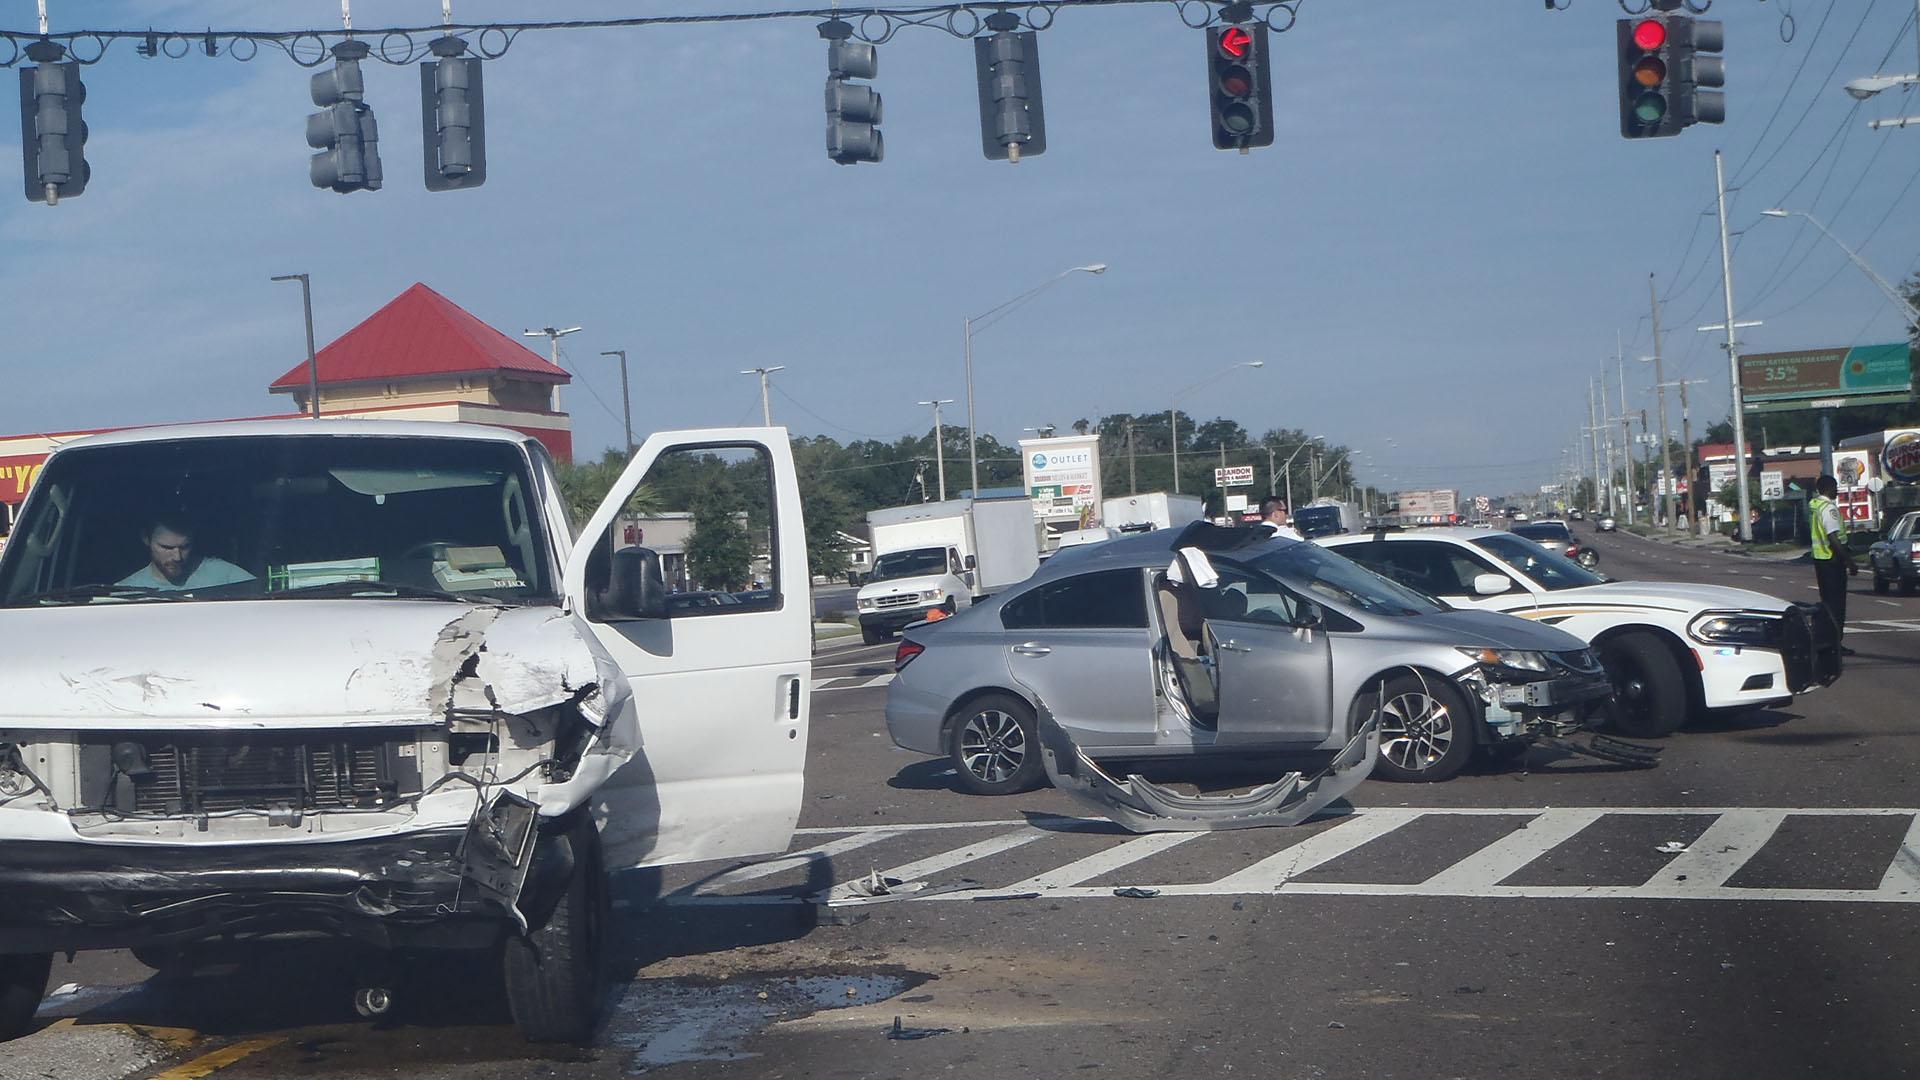 72-year-old man killed in Brandon car crash   WFLA